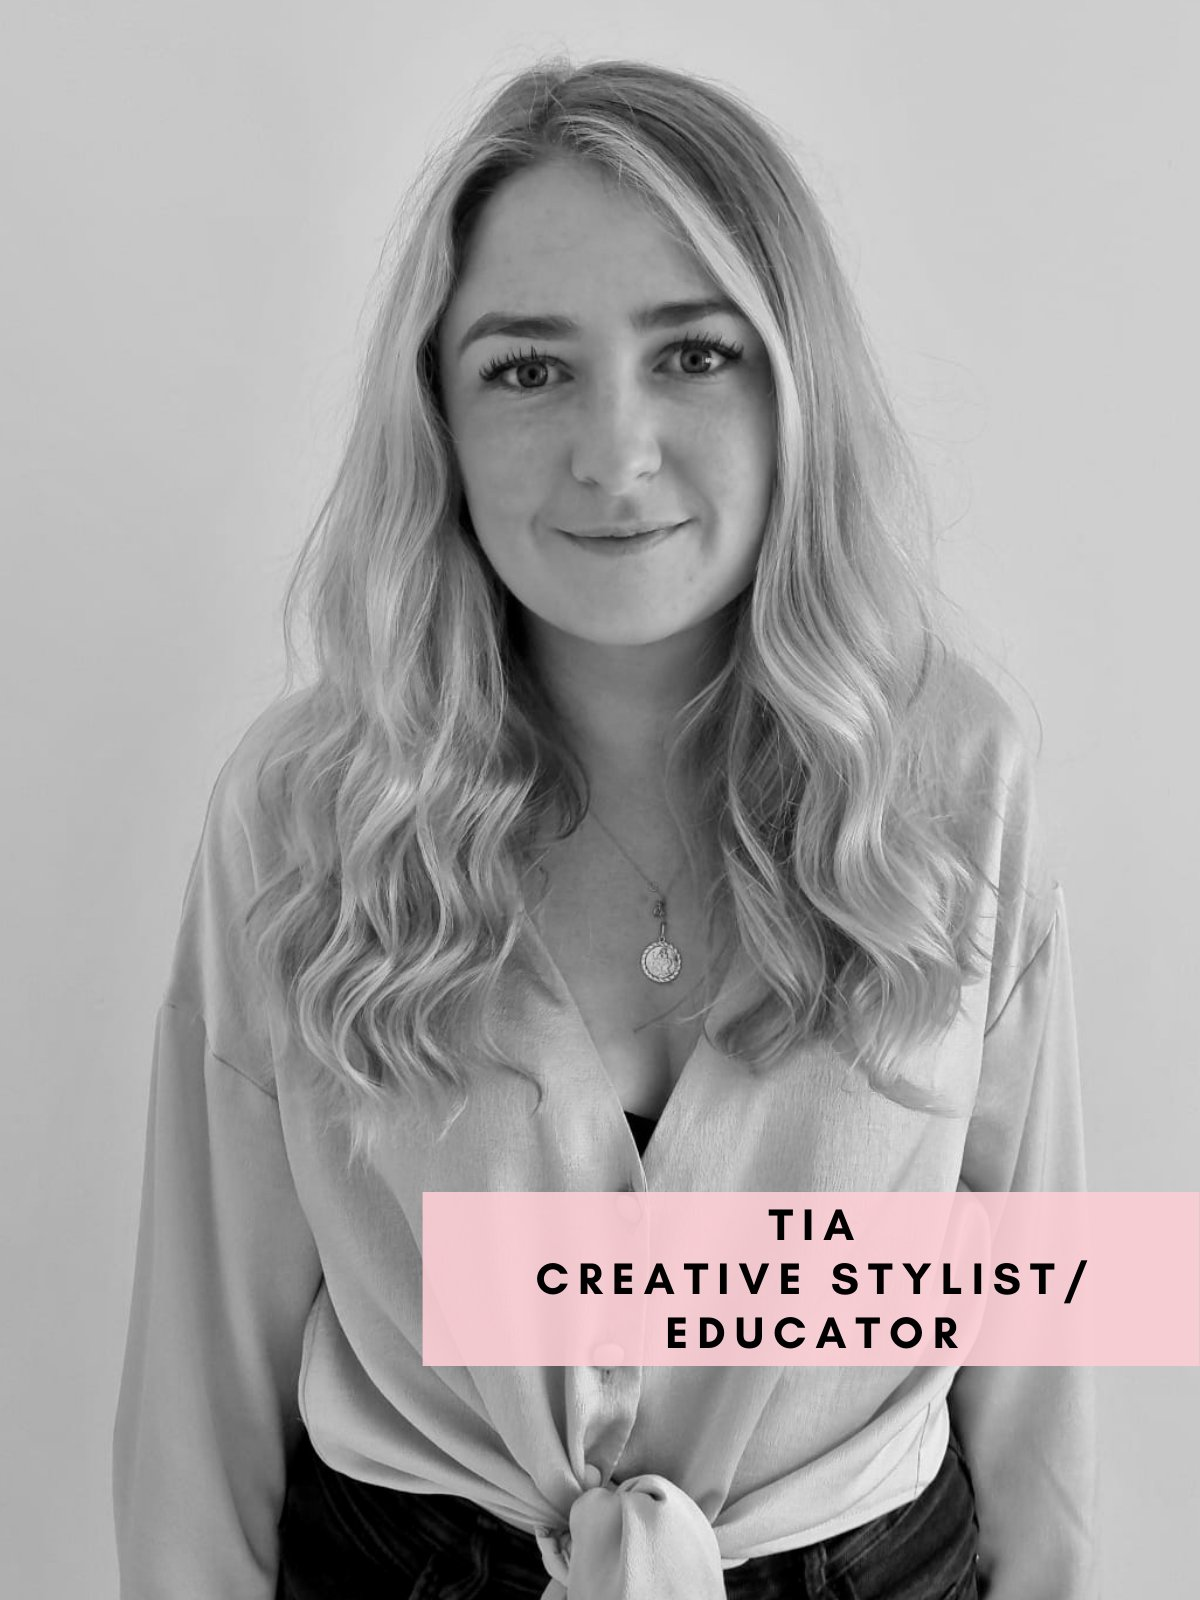 Tia – Creative Stylist/Educator